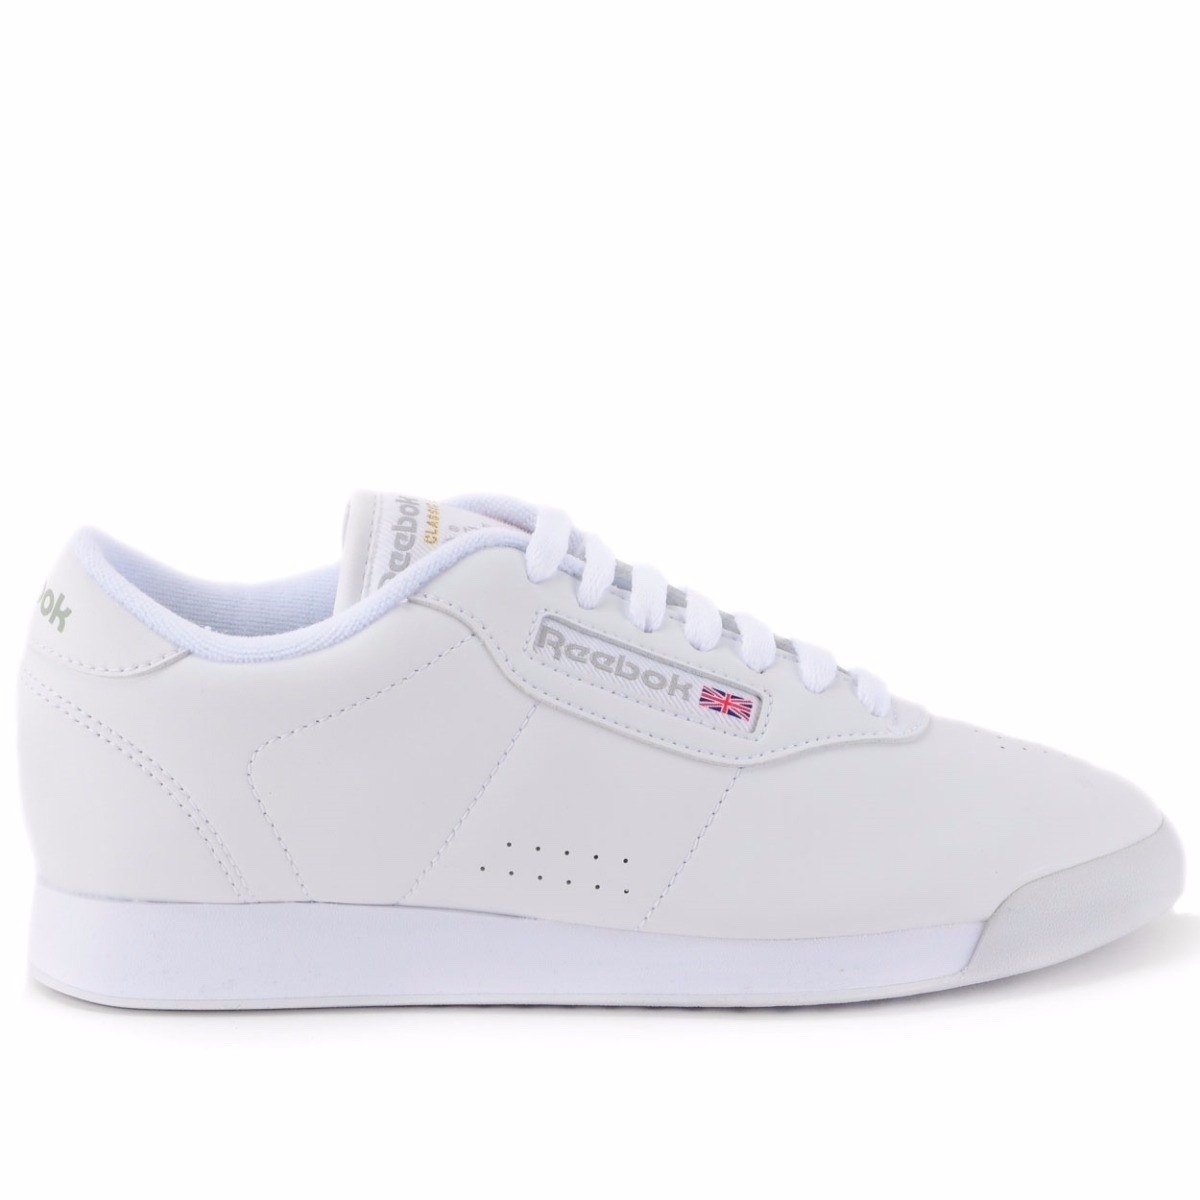 154a0ad4589 tênis reebok princess white low classic sneaker retro branco. Carregando  zoom.